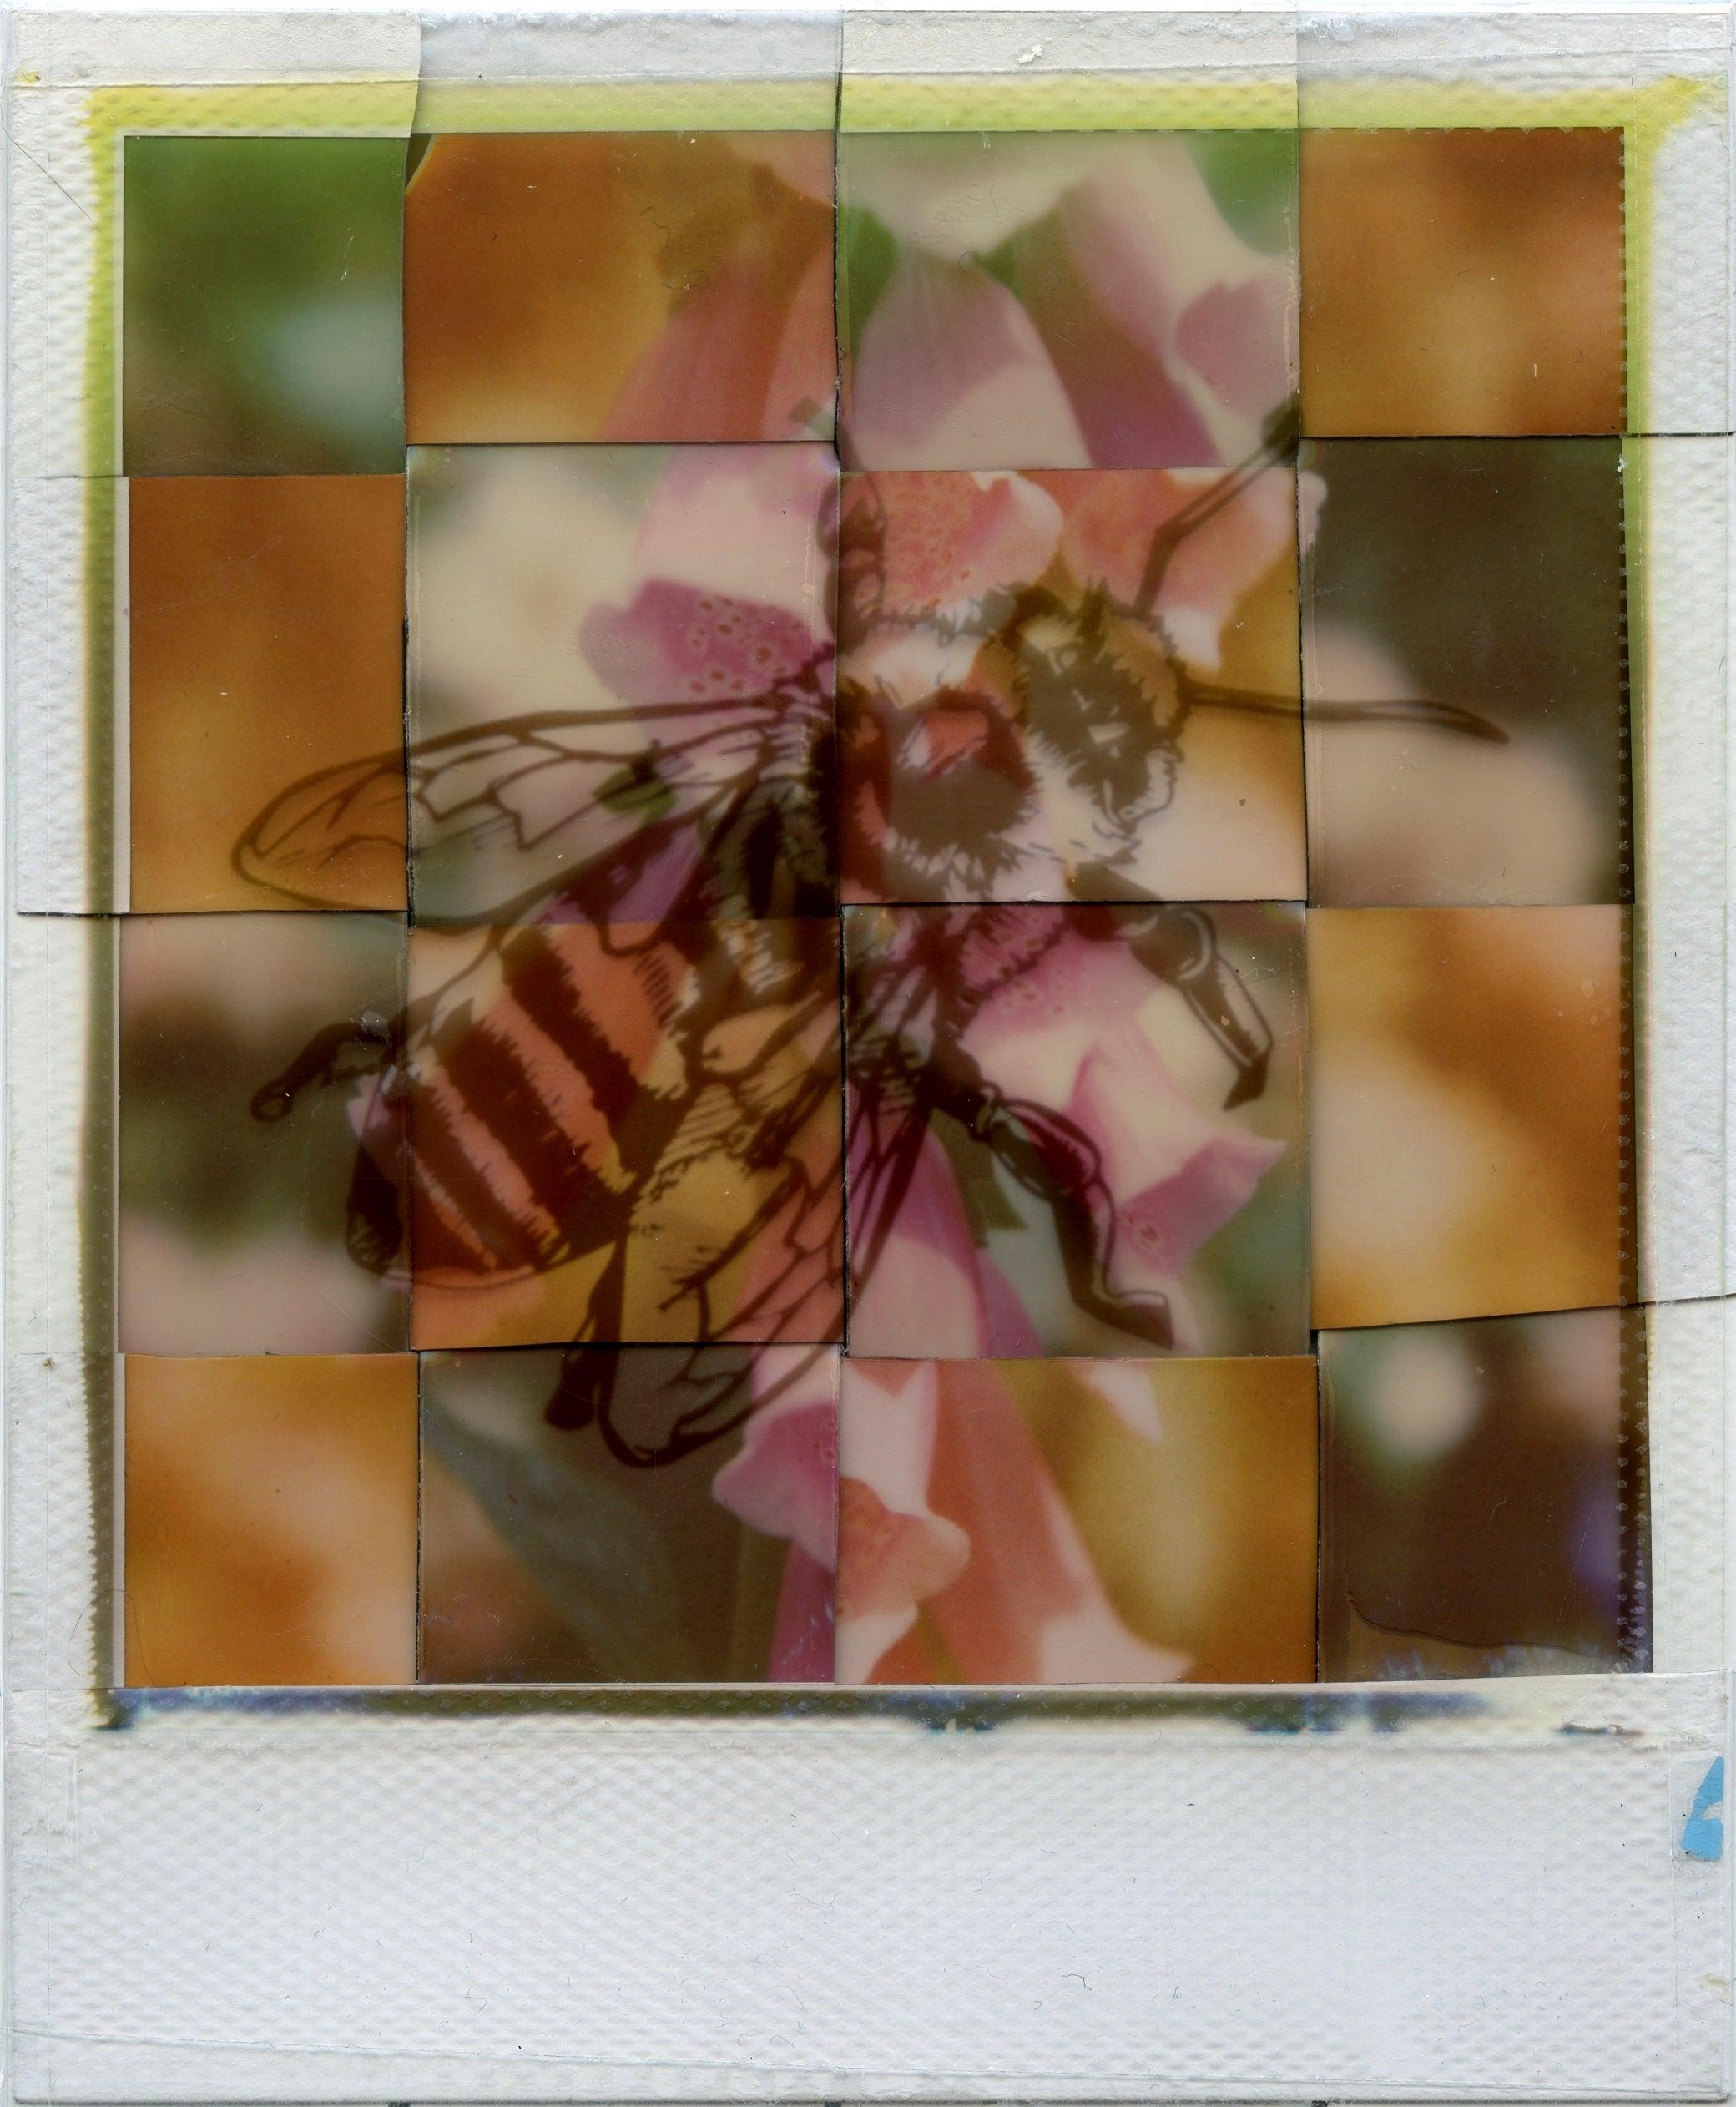 Generation A - Contemporary, Polaroid, Photograph, Bees, Abstract, Color